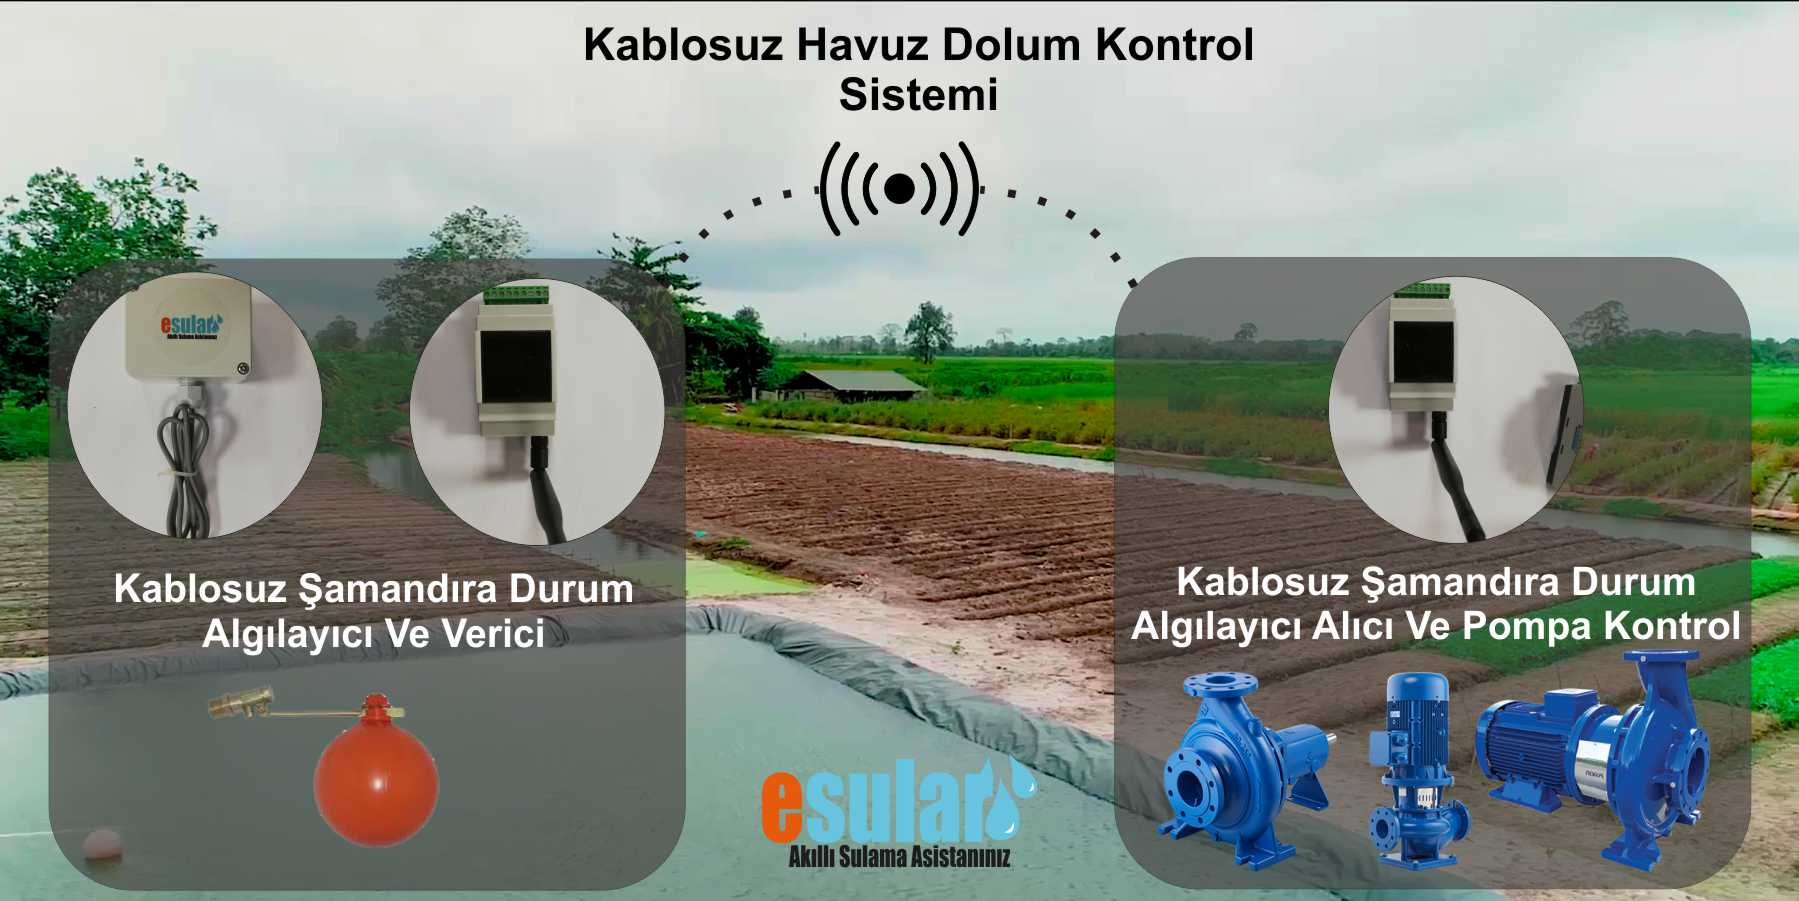 kablosuz havuz dolum kontrol sistemi